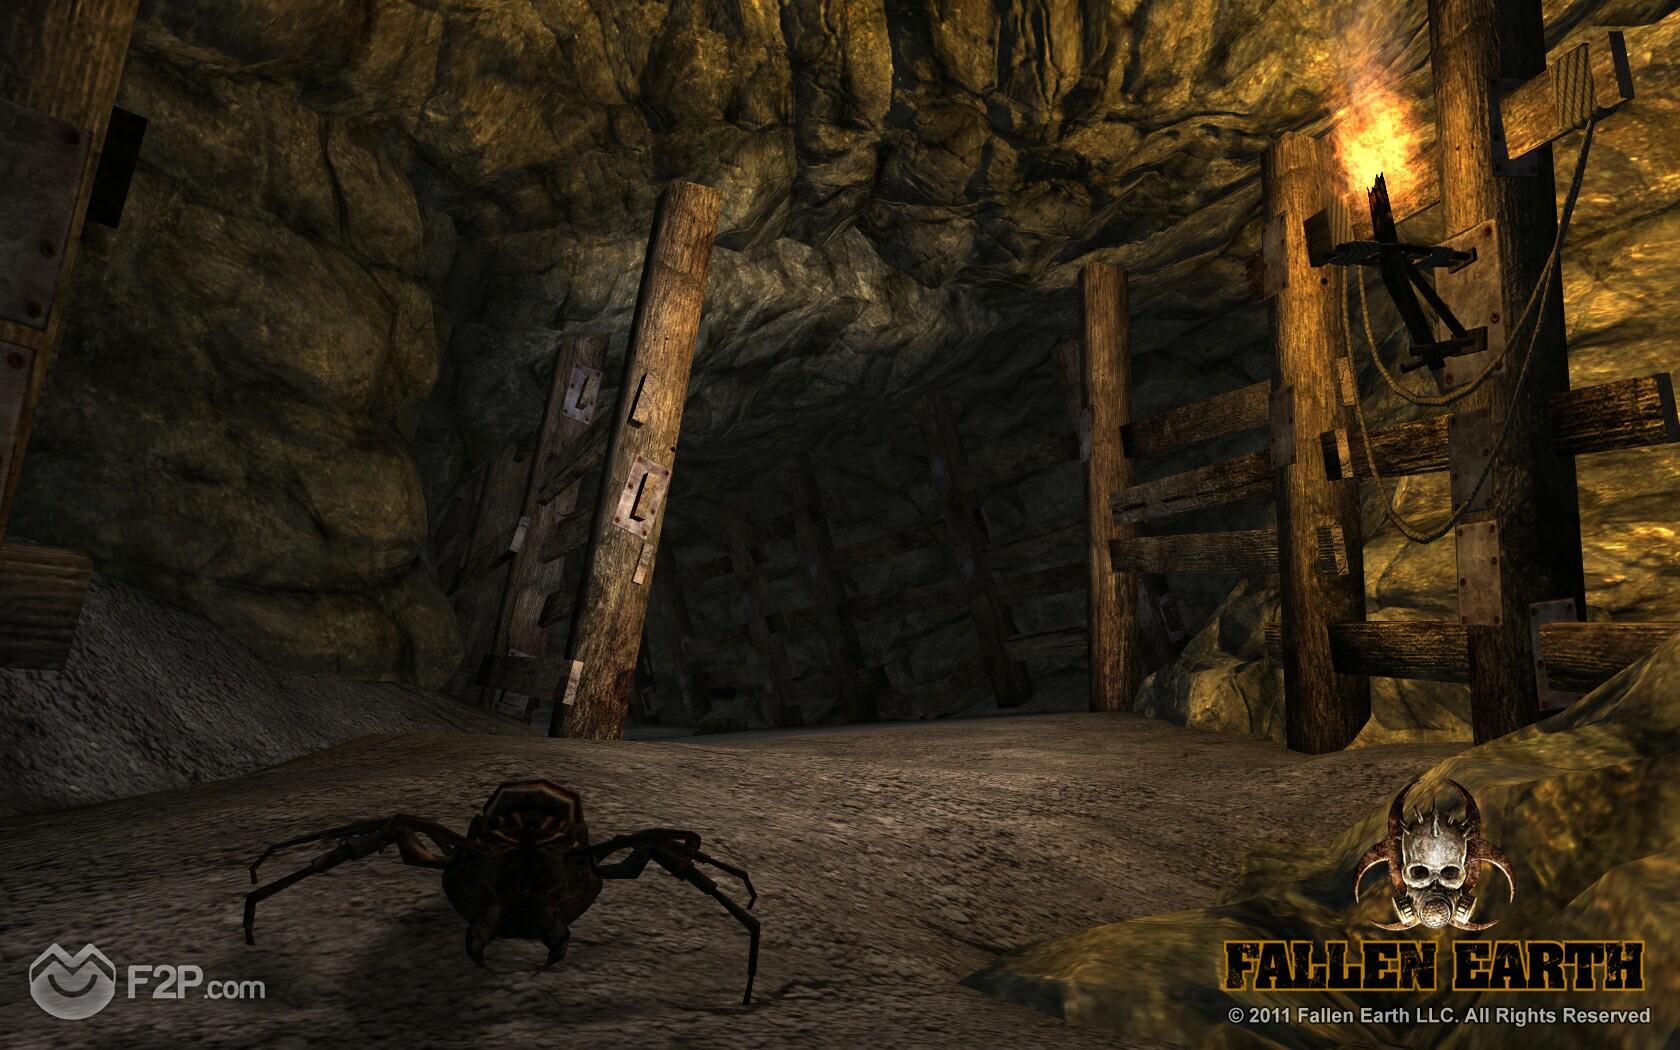 Click image for larger version.Name:fallenf21.jpgViews:201Size:442.7 KBID:4912